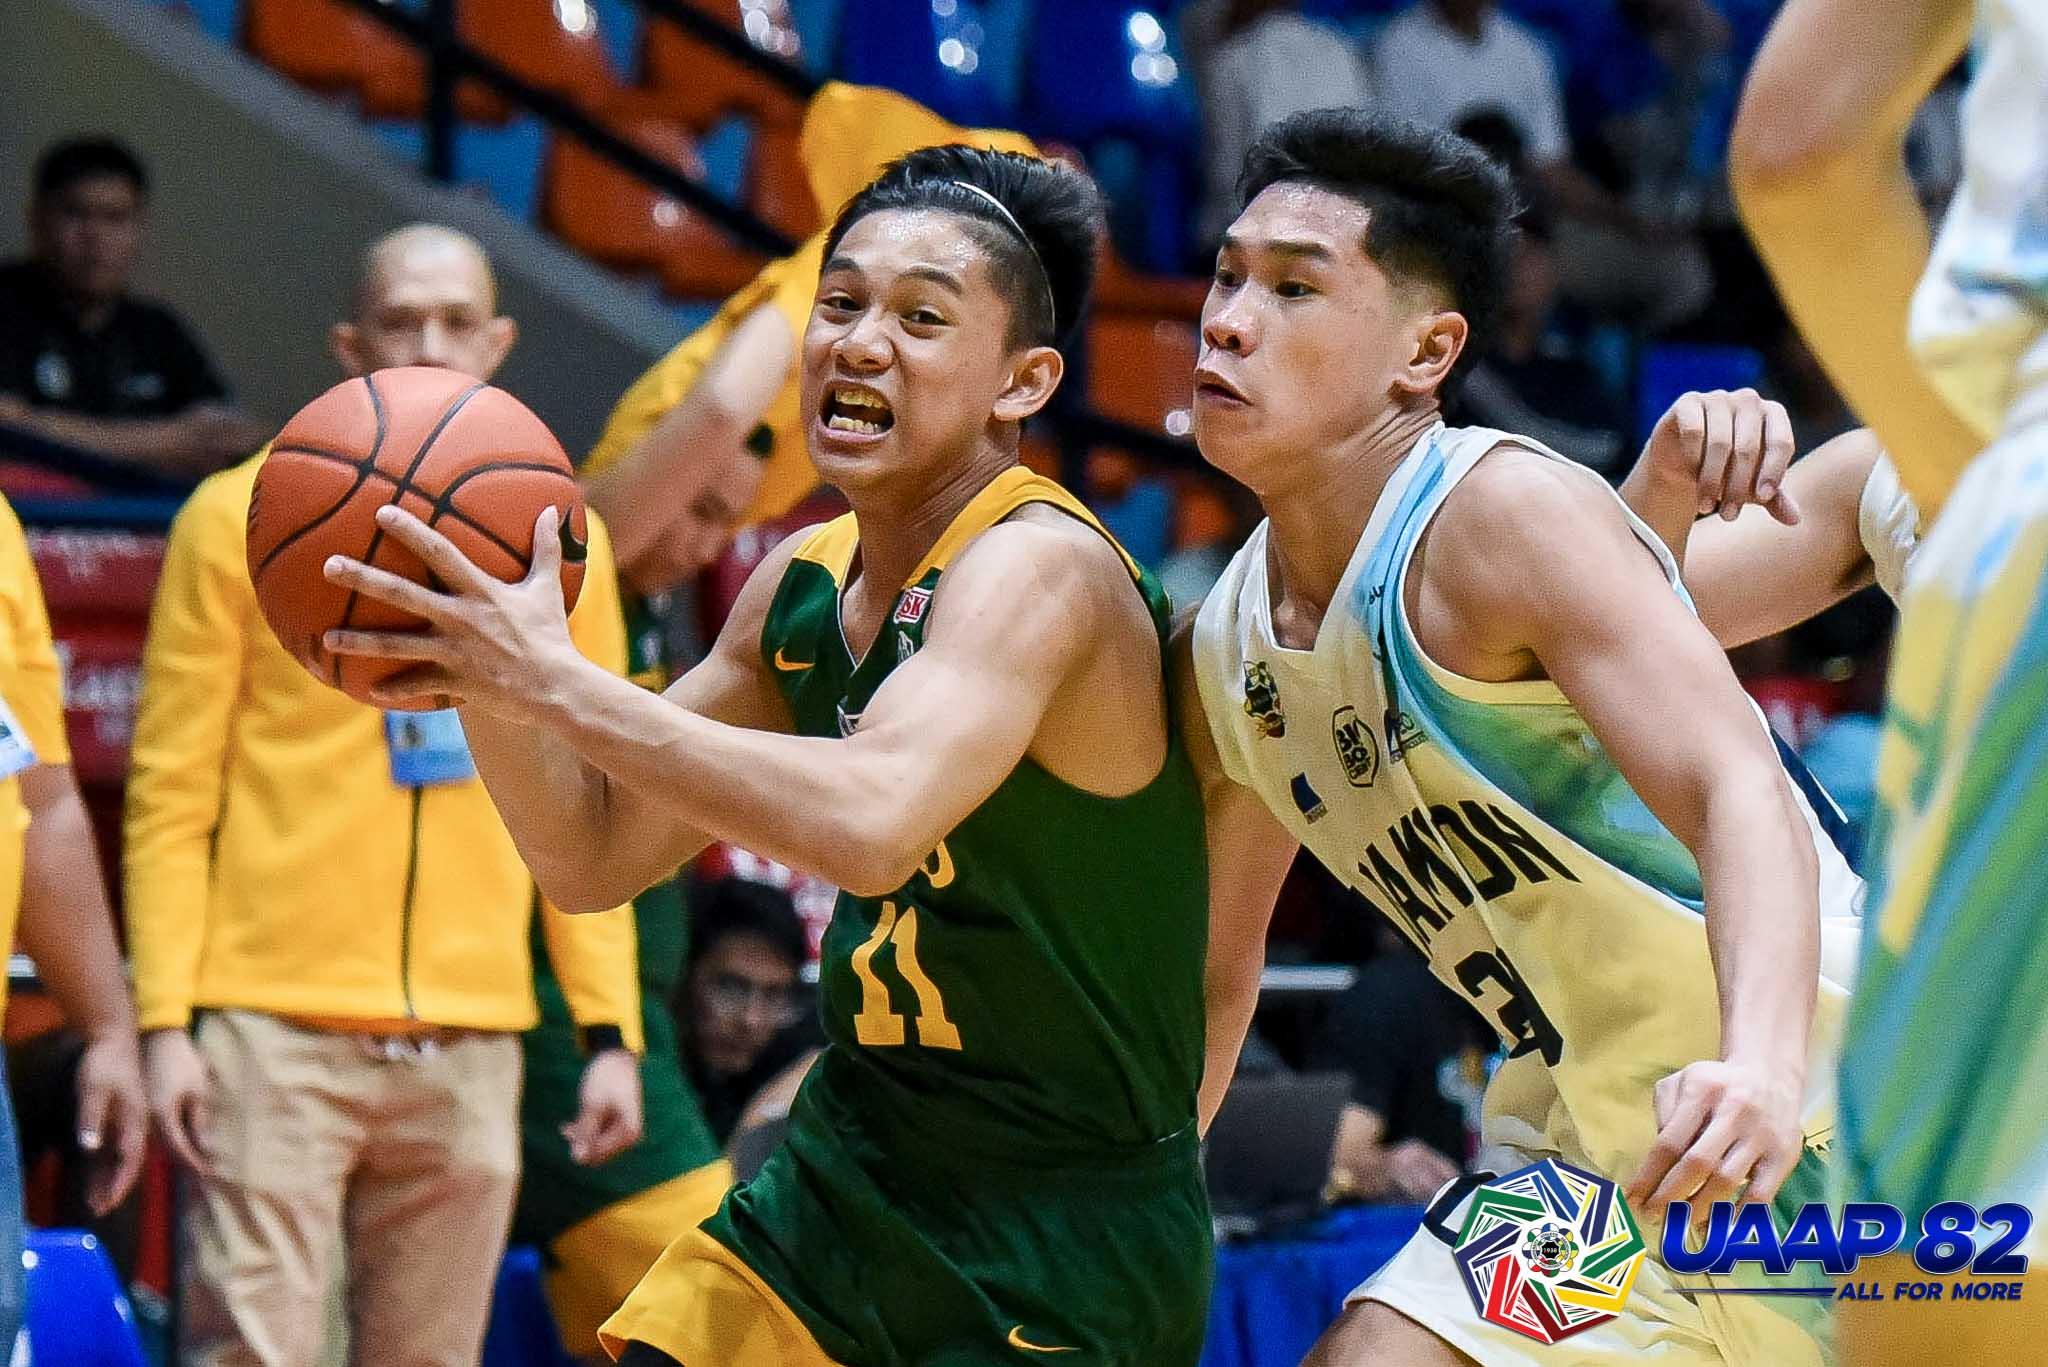 UAAP82-JRS-BASKETBALL-3RD-PHOTO-FEU-ESTACIO Fortea, Figueroa, Estacio lead crack UAAP HS class of '21 ADMU Basketball FEU News NU UAAP UP UST  - philippine sports news